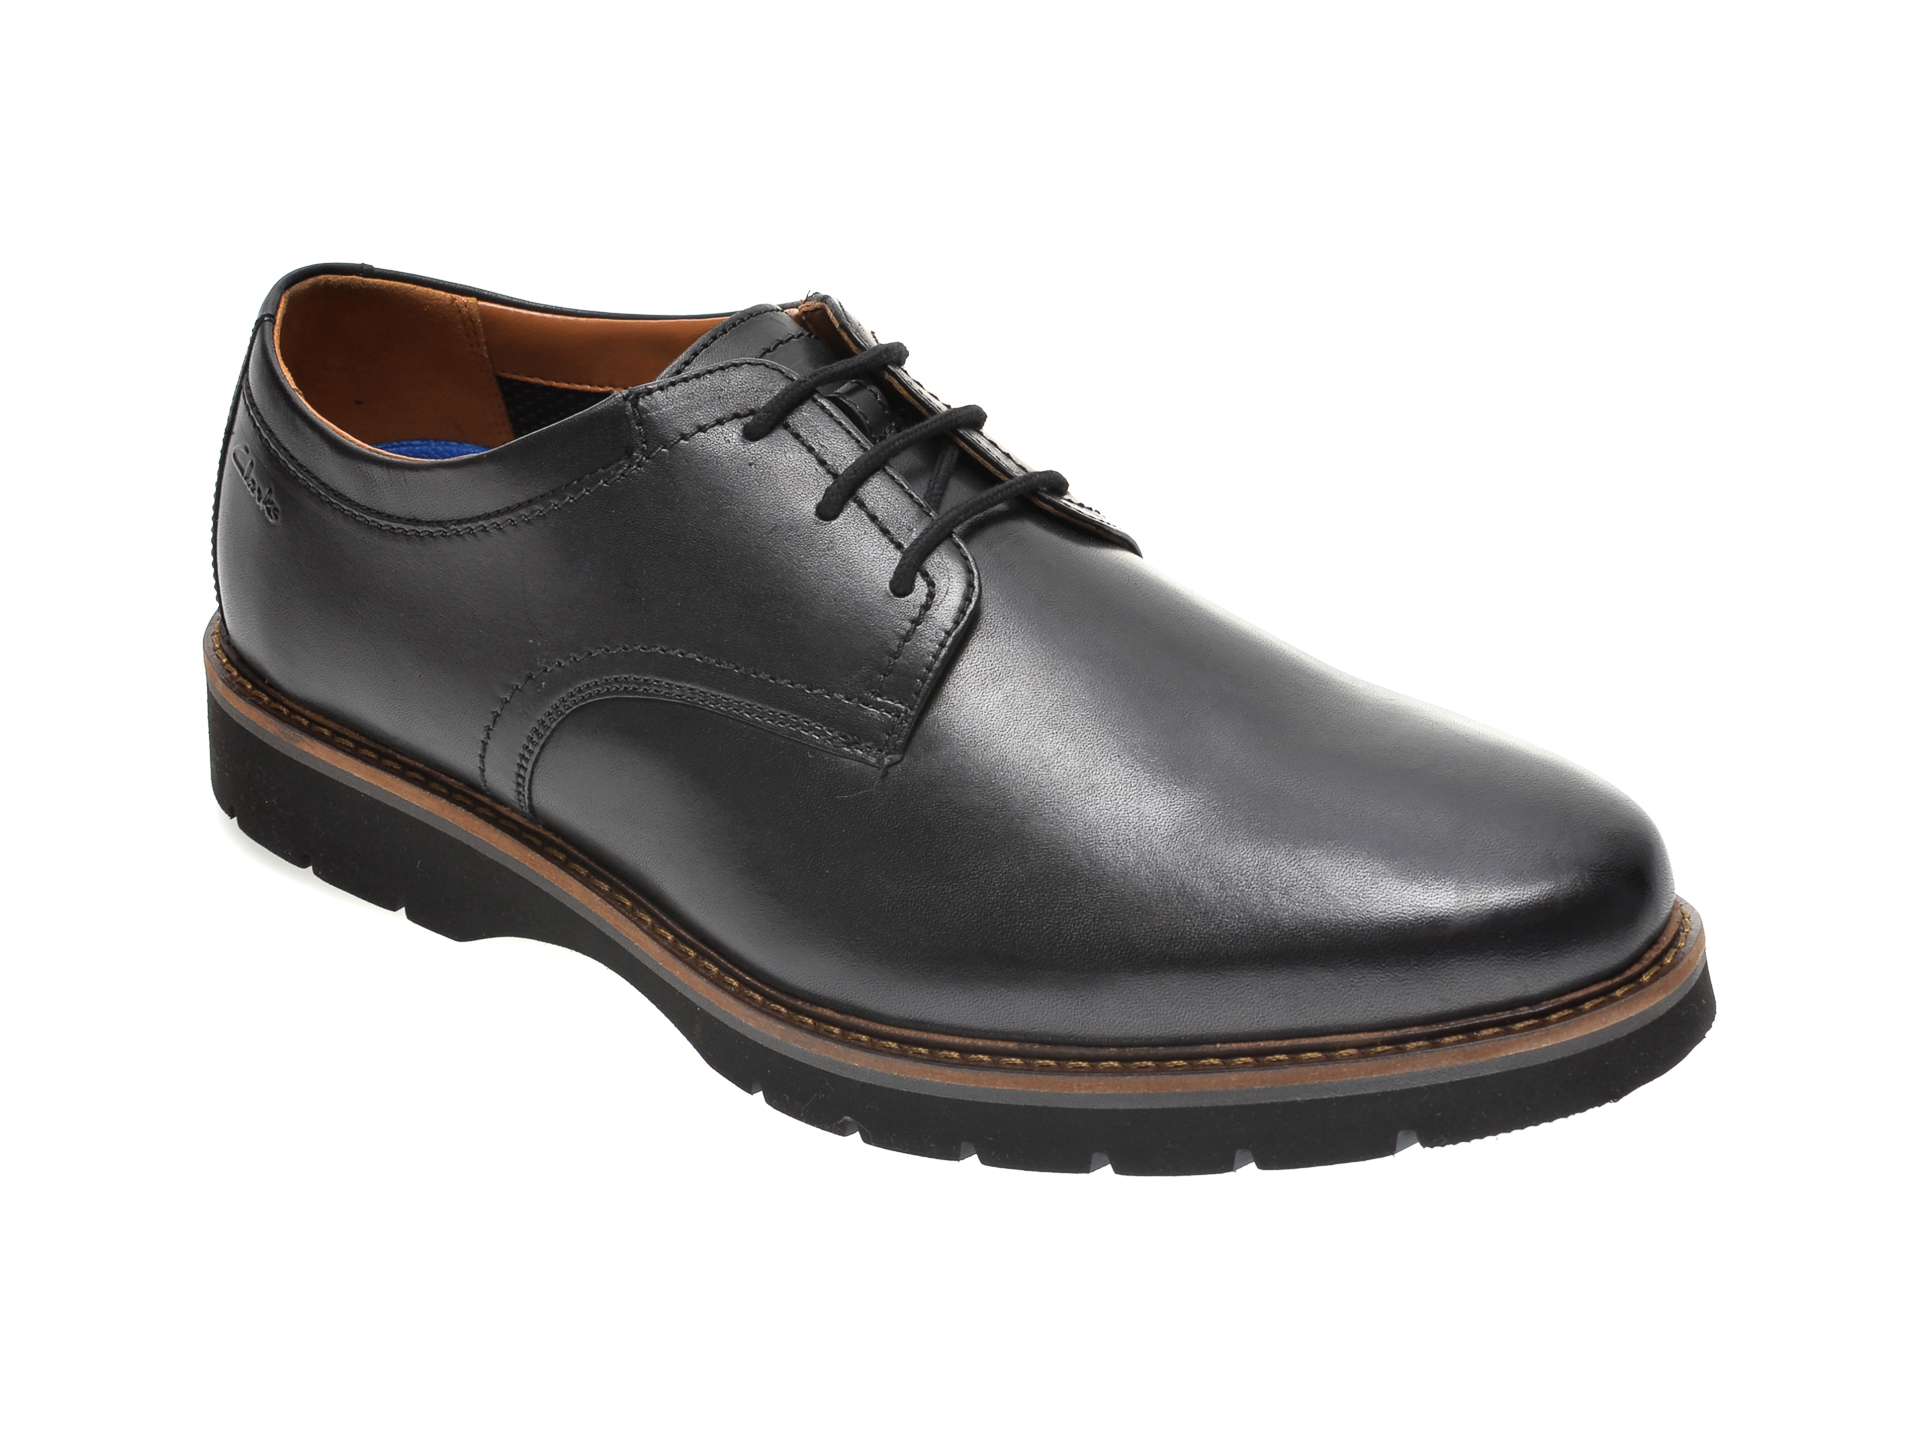 Pantofi CLARKS negri, BAYHILL PLAIN, din piele naturala